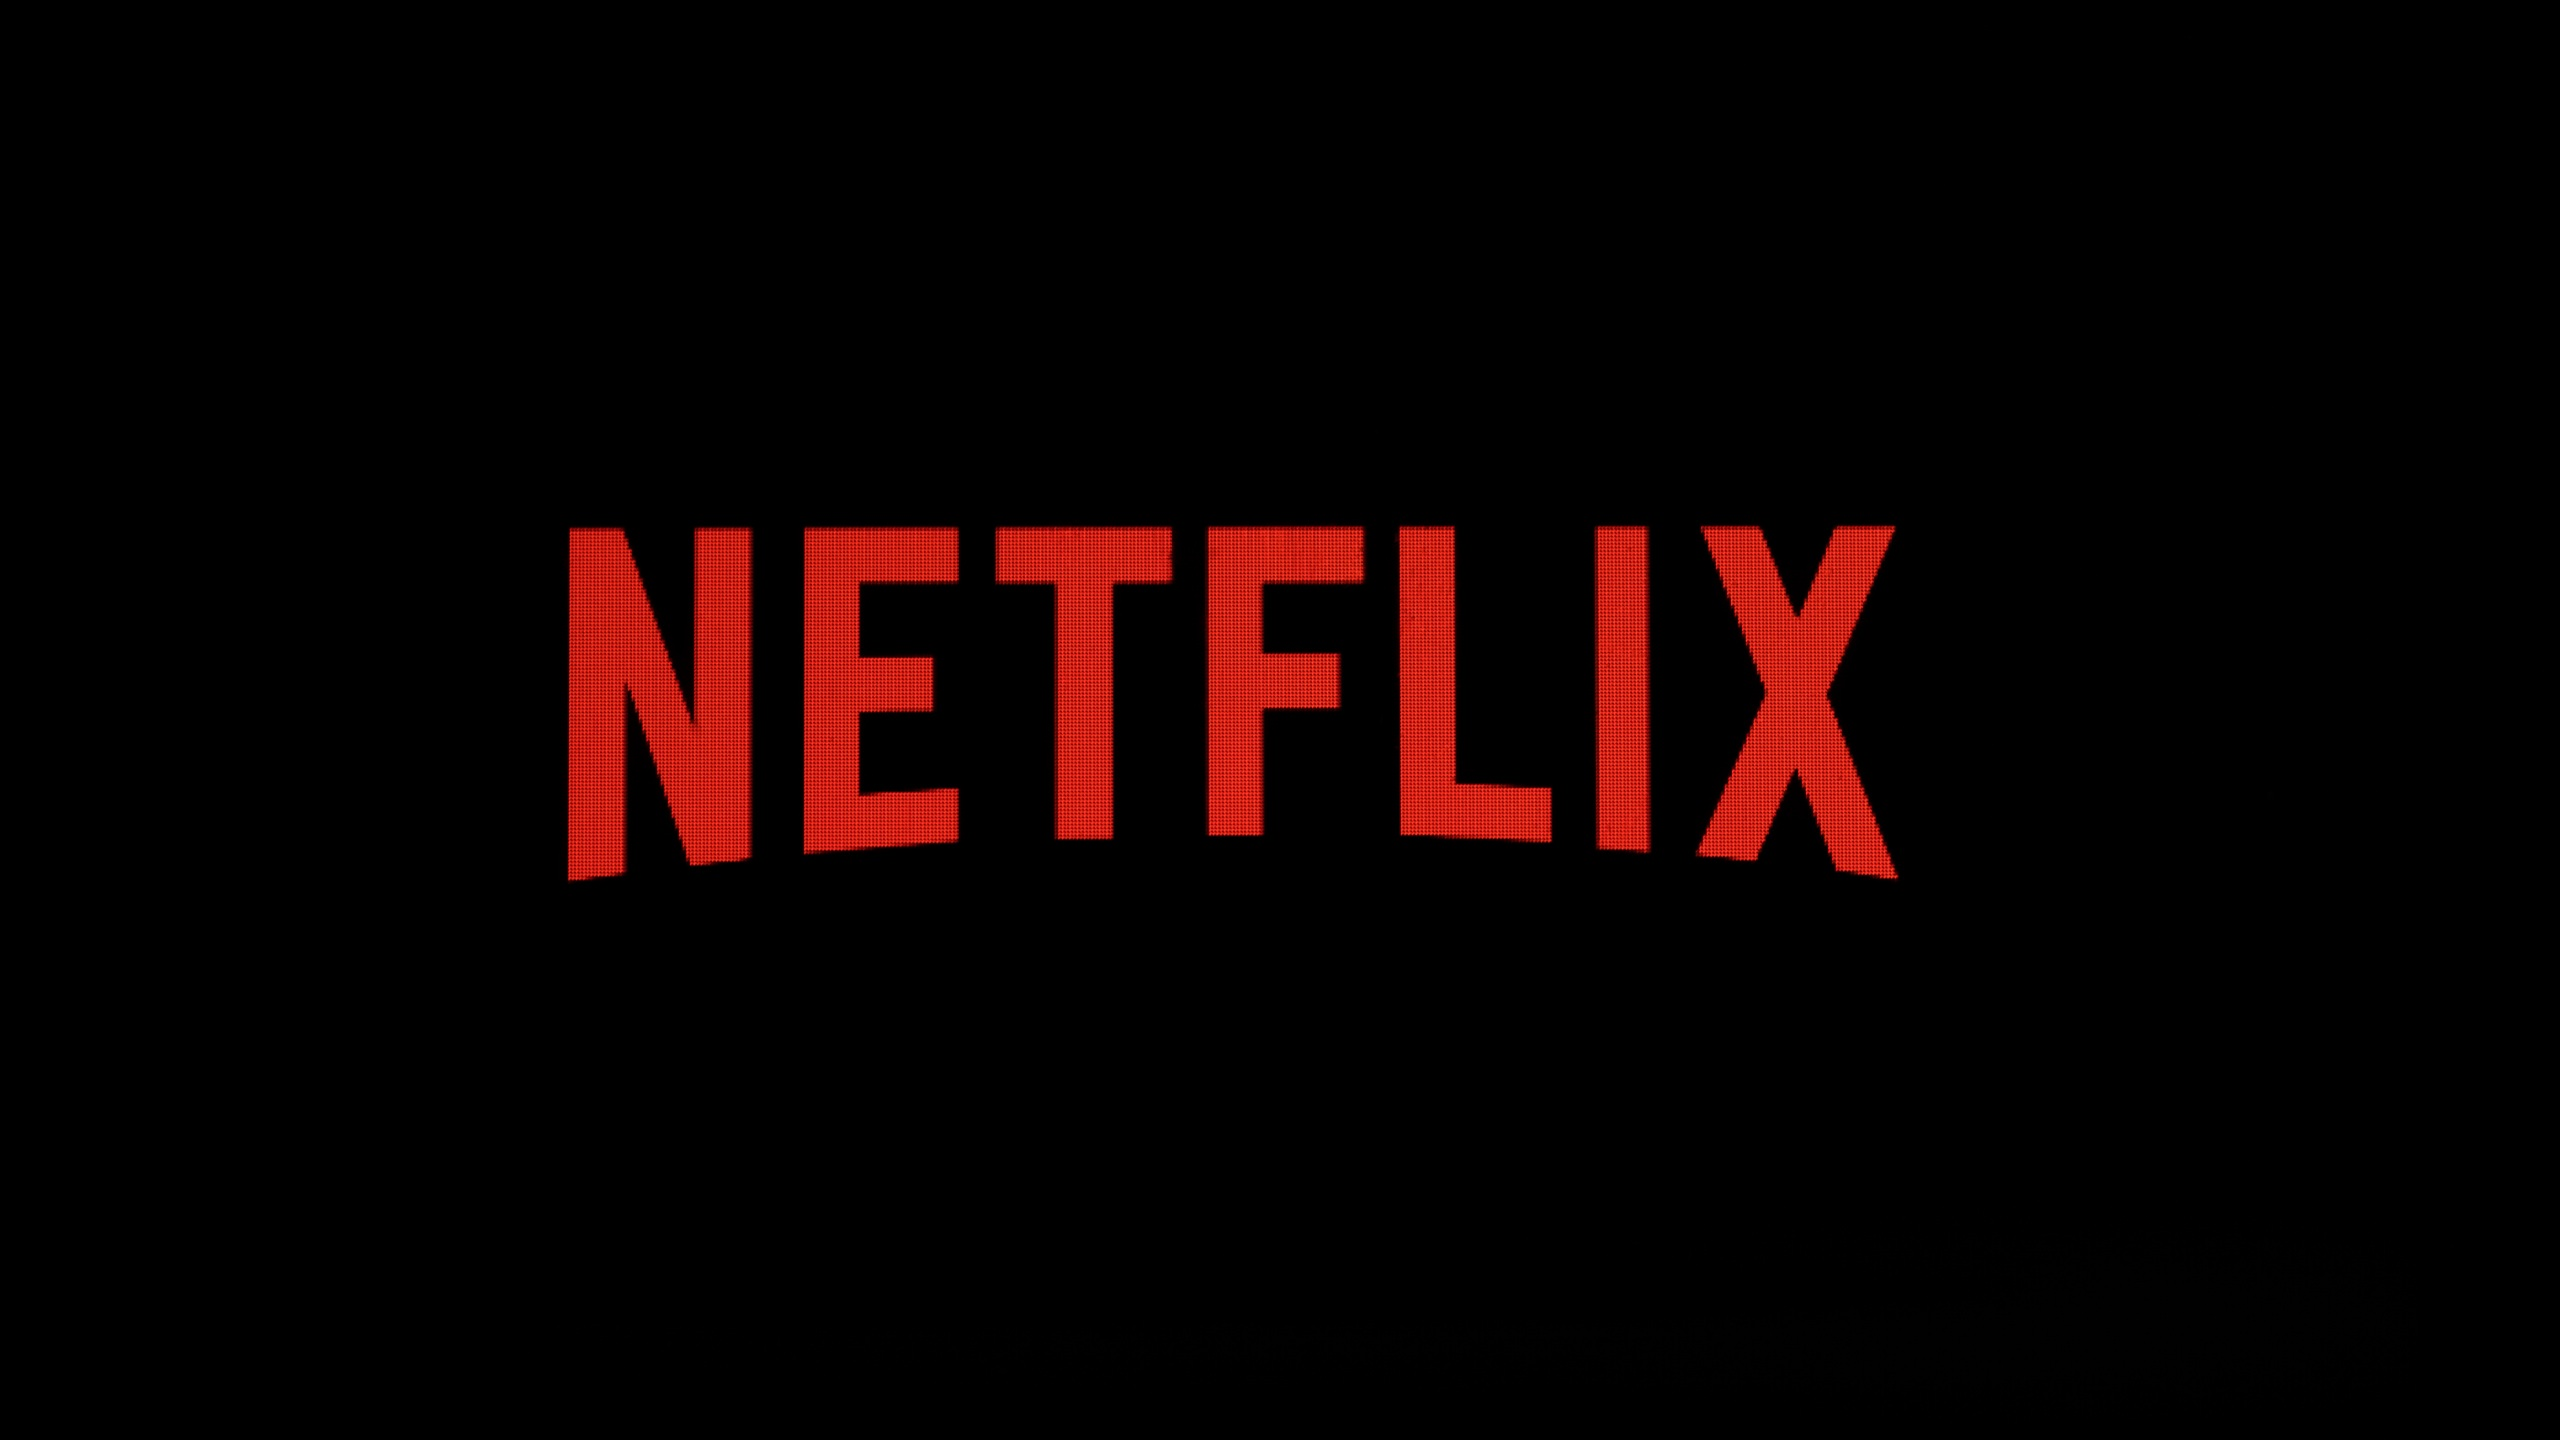 Netflix_Production_Hub_87733-159532.jpg42335701